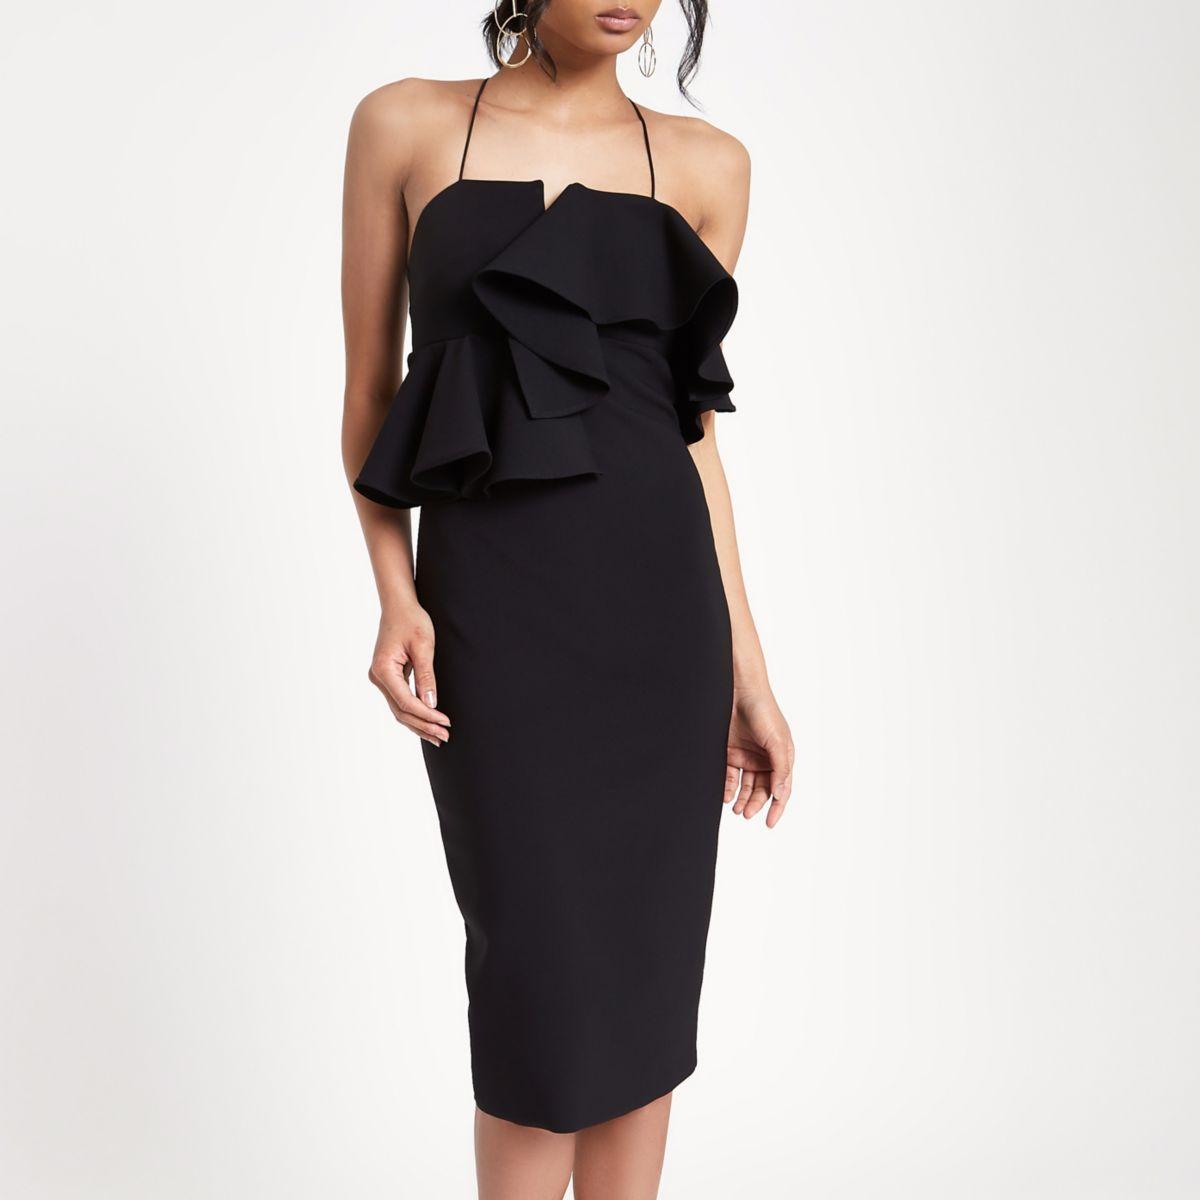 Black peplum waist bodycon dress